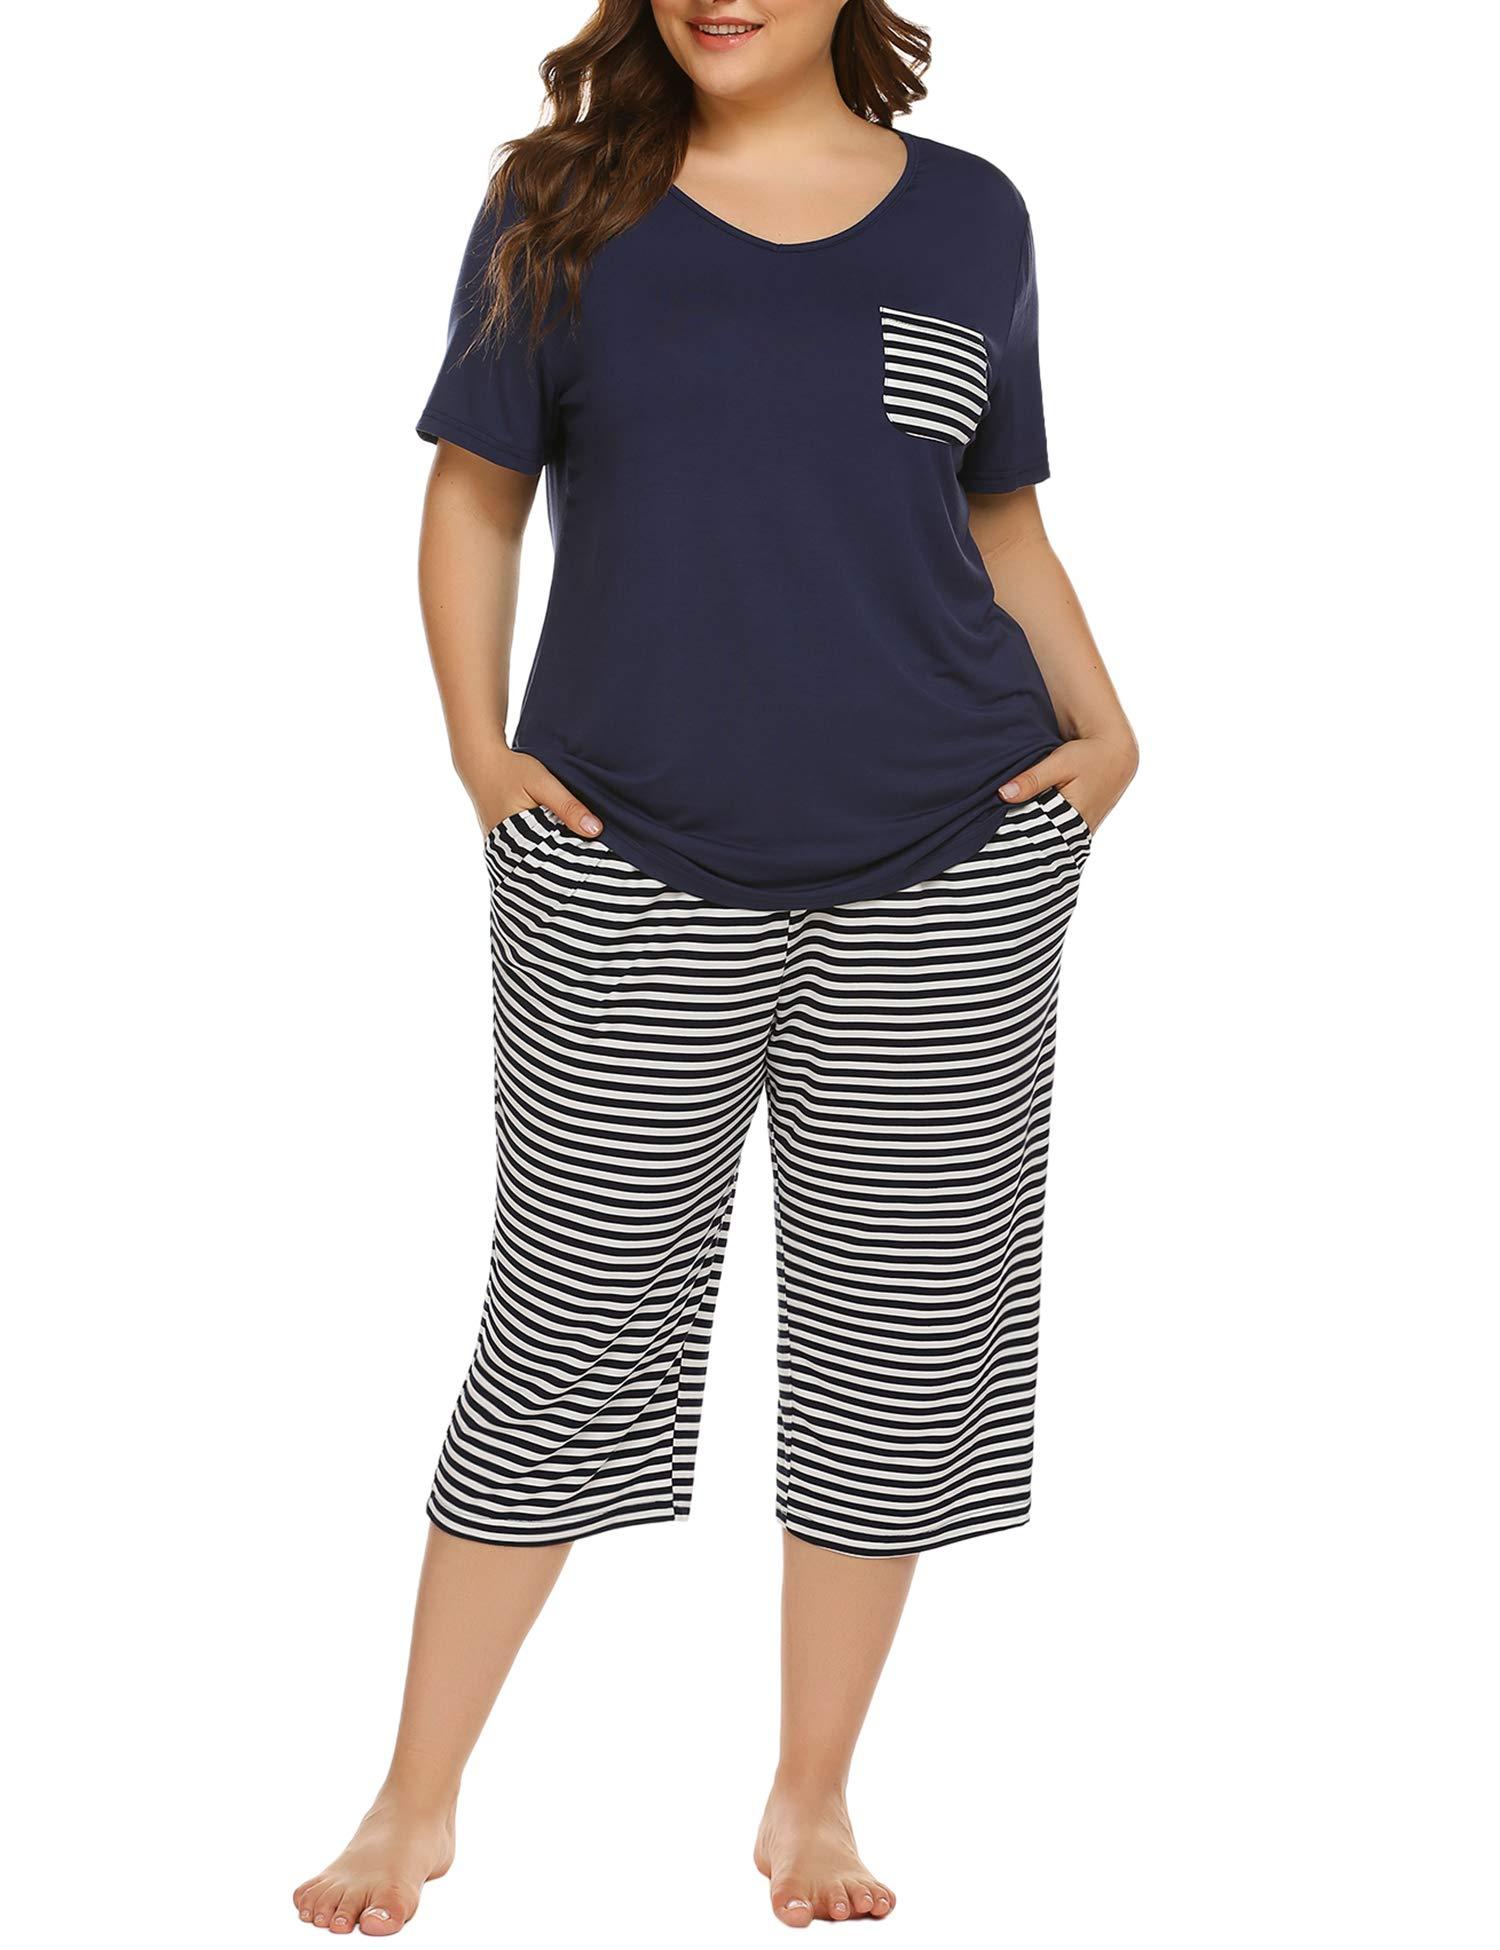 IN'VOLAND Womens Plus Size Pajama Set Capri Pants Striped Short Sleeve Pj Sets Sleepwear Set with Pockets